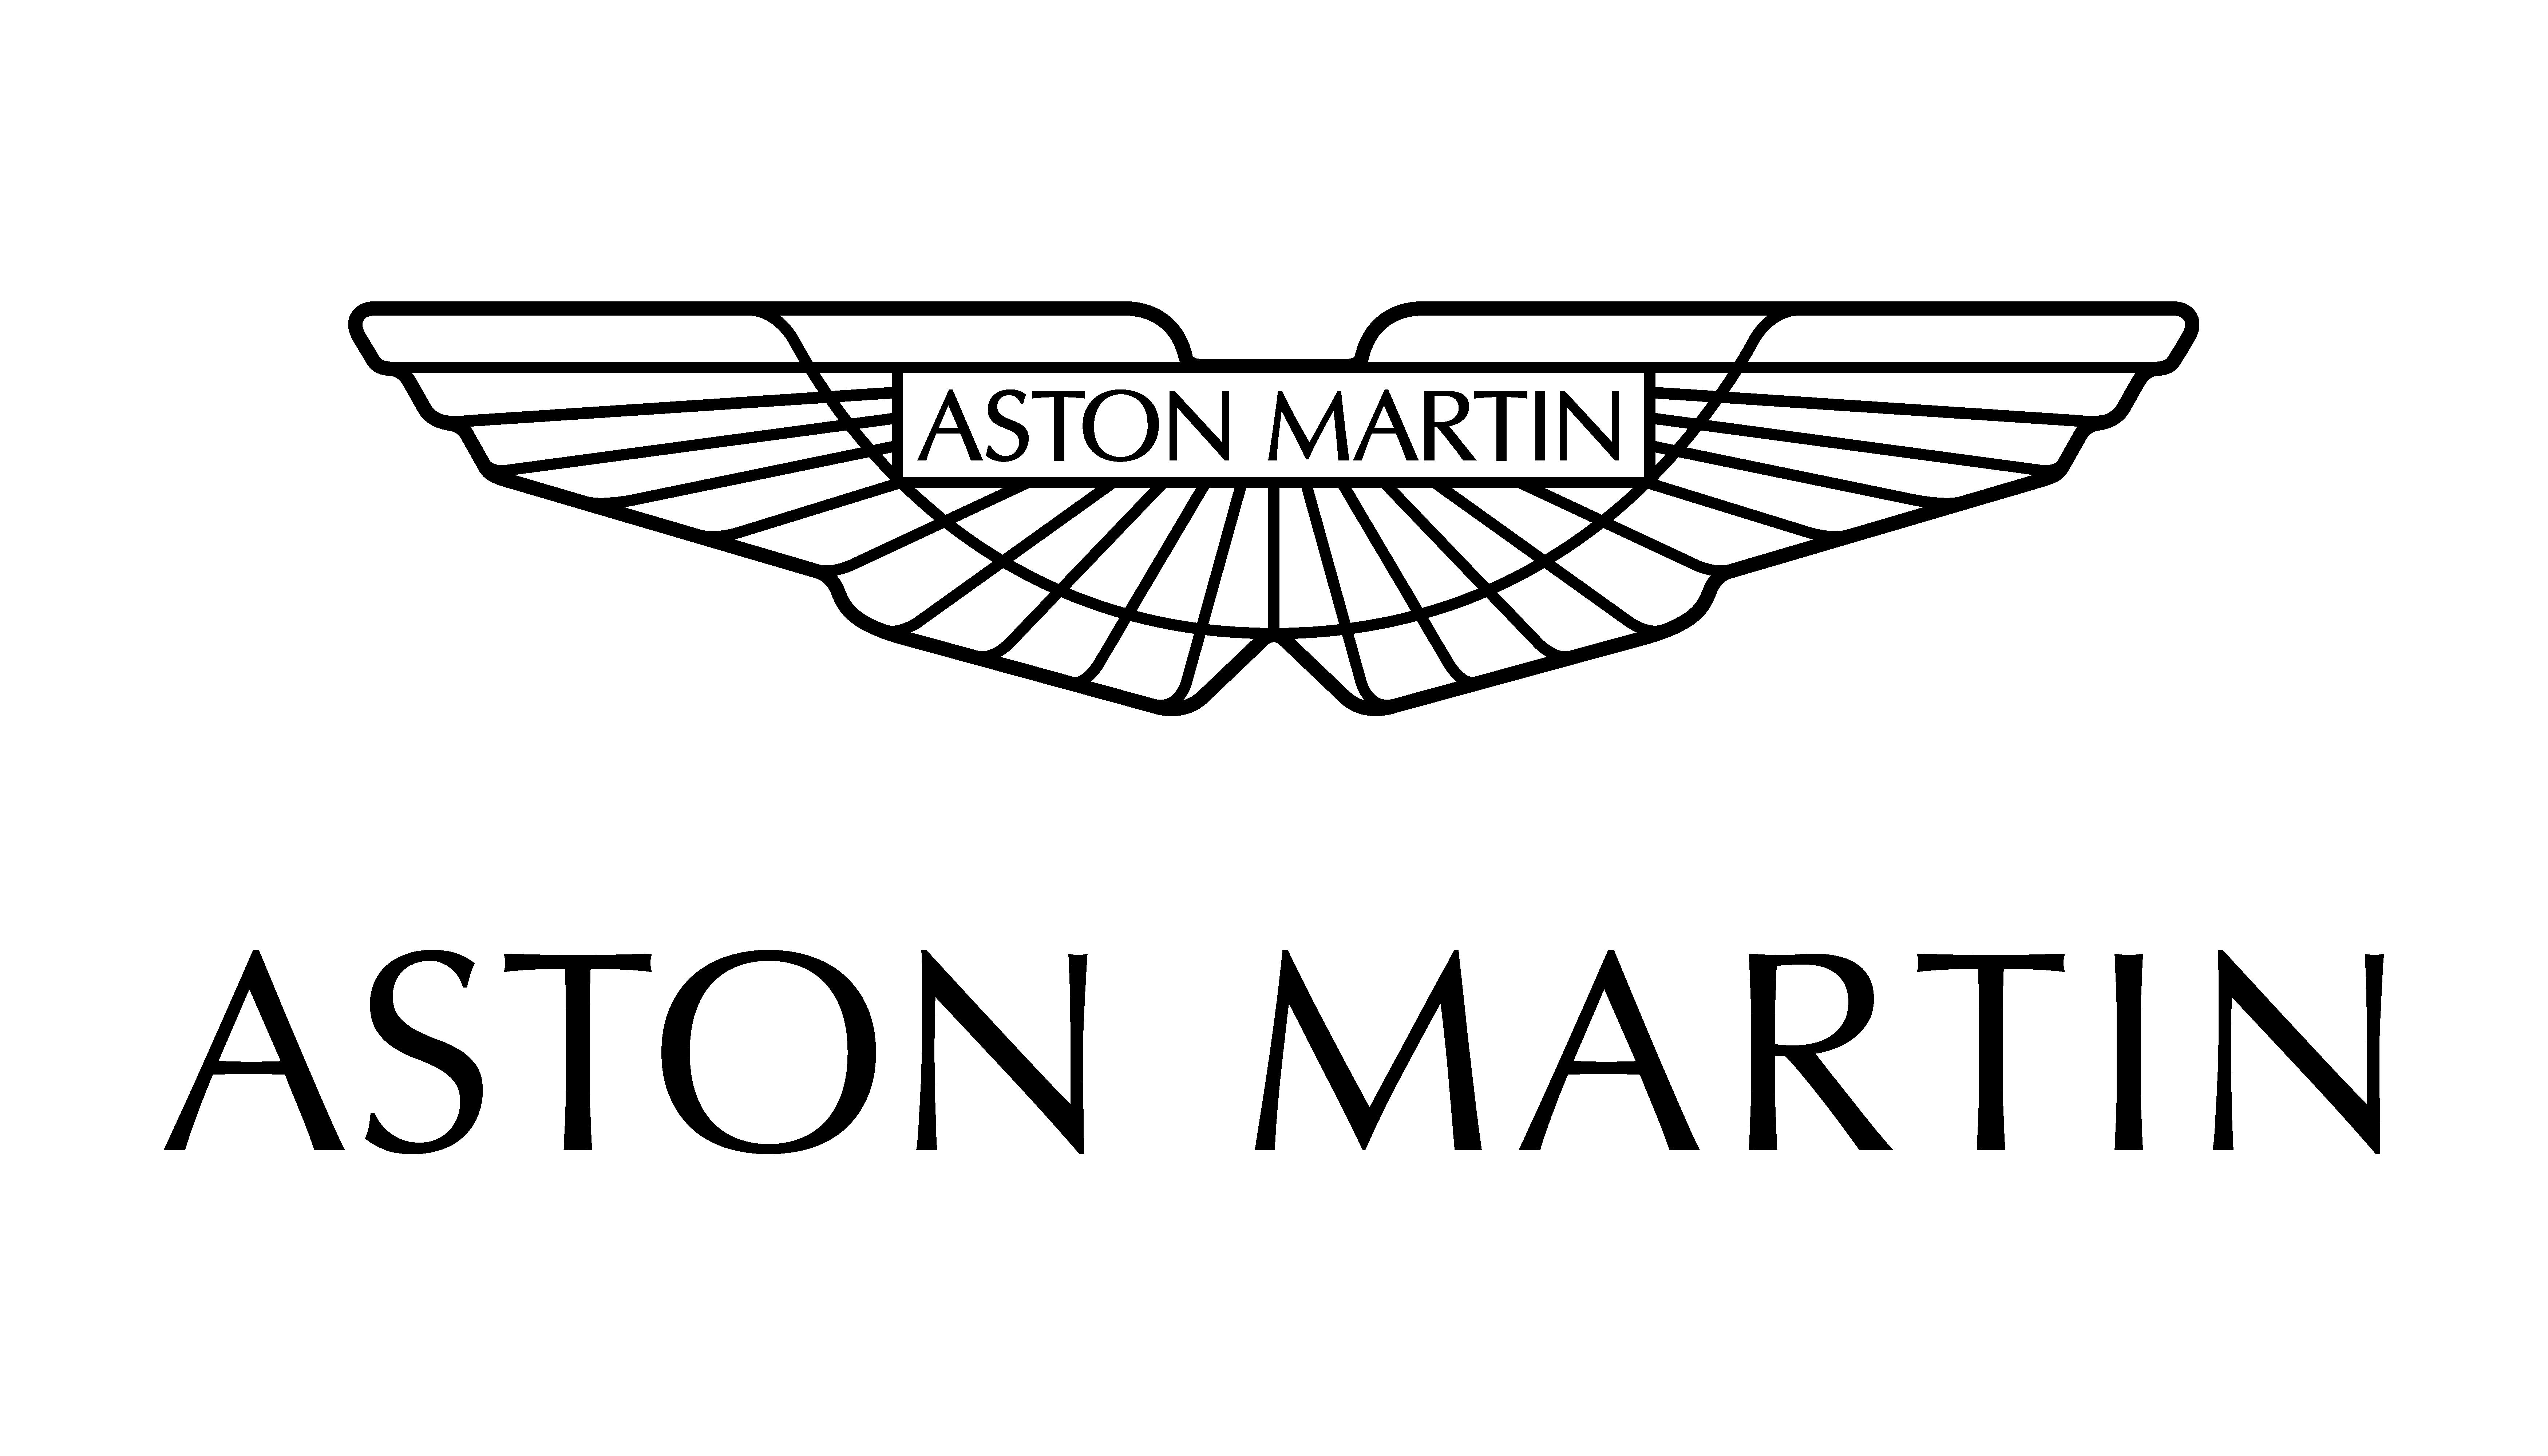 Aston-Martin-logo-2003-7000x4000.png (7000×4000)